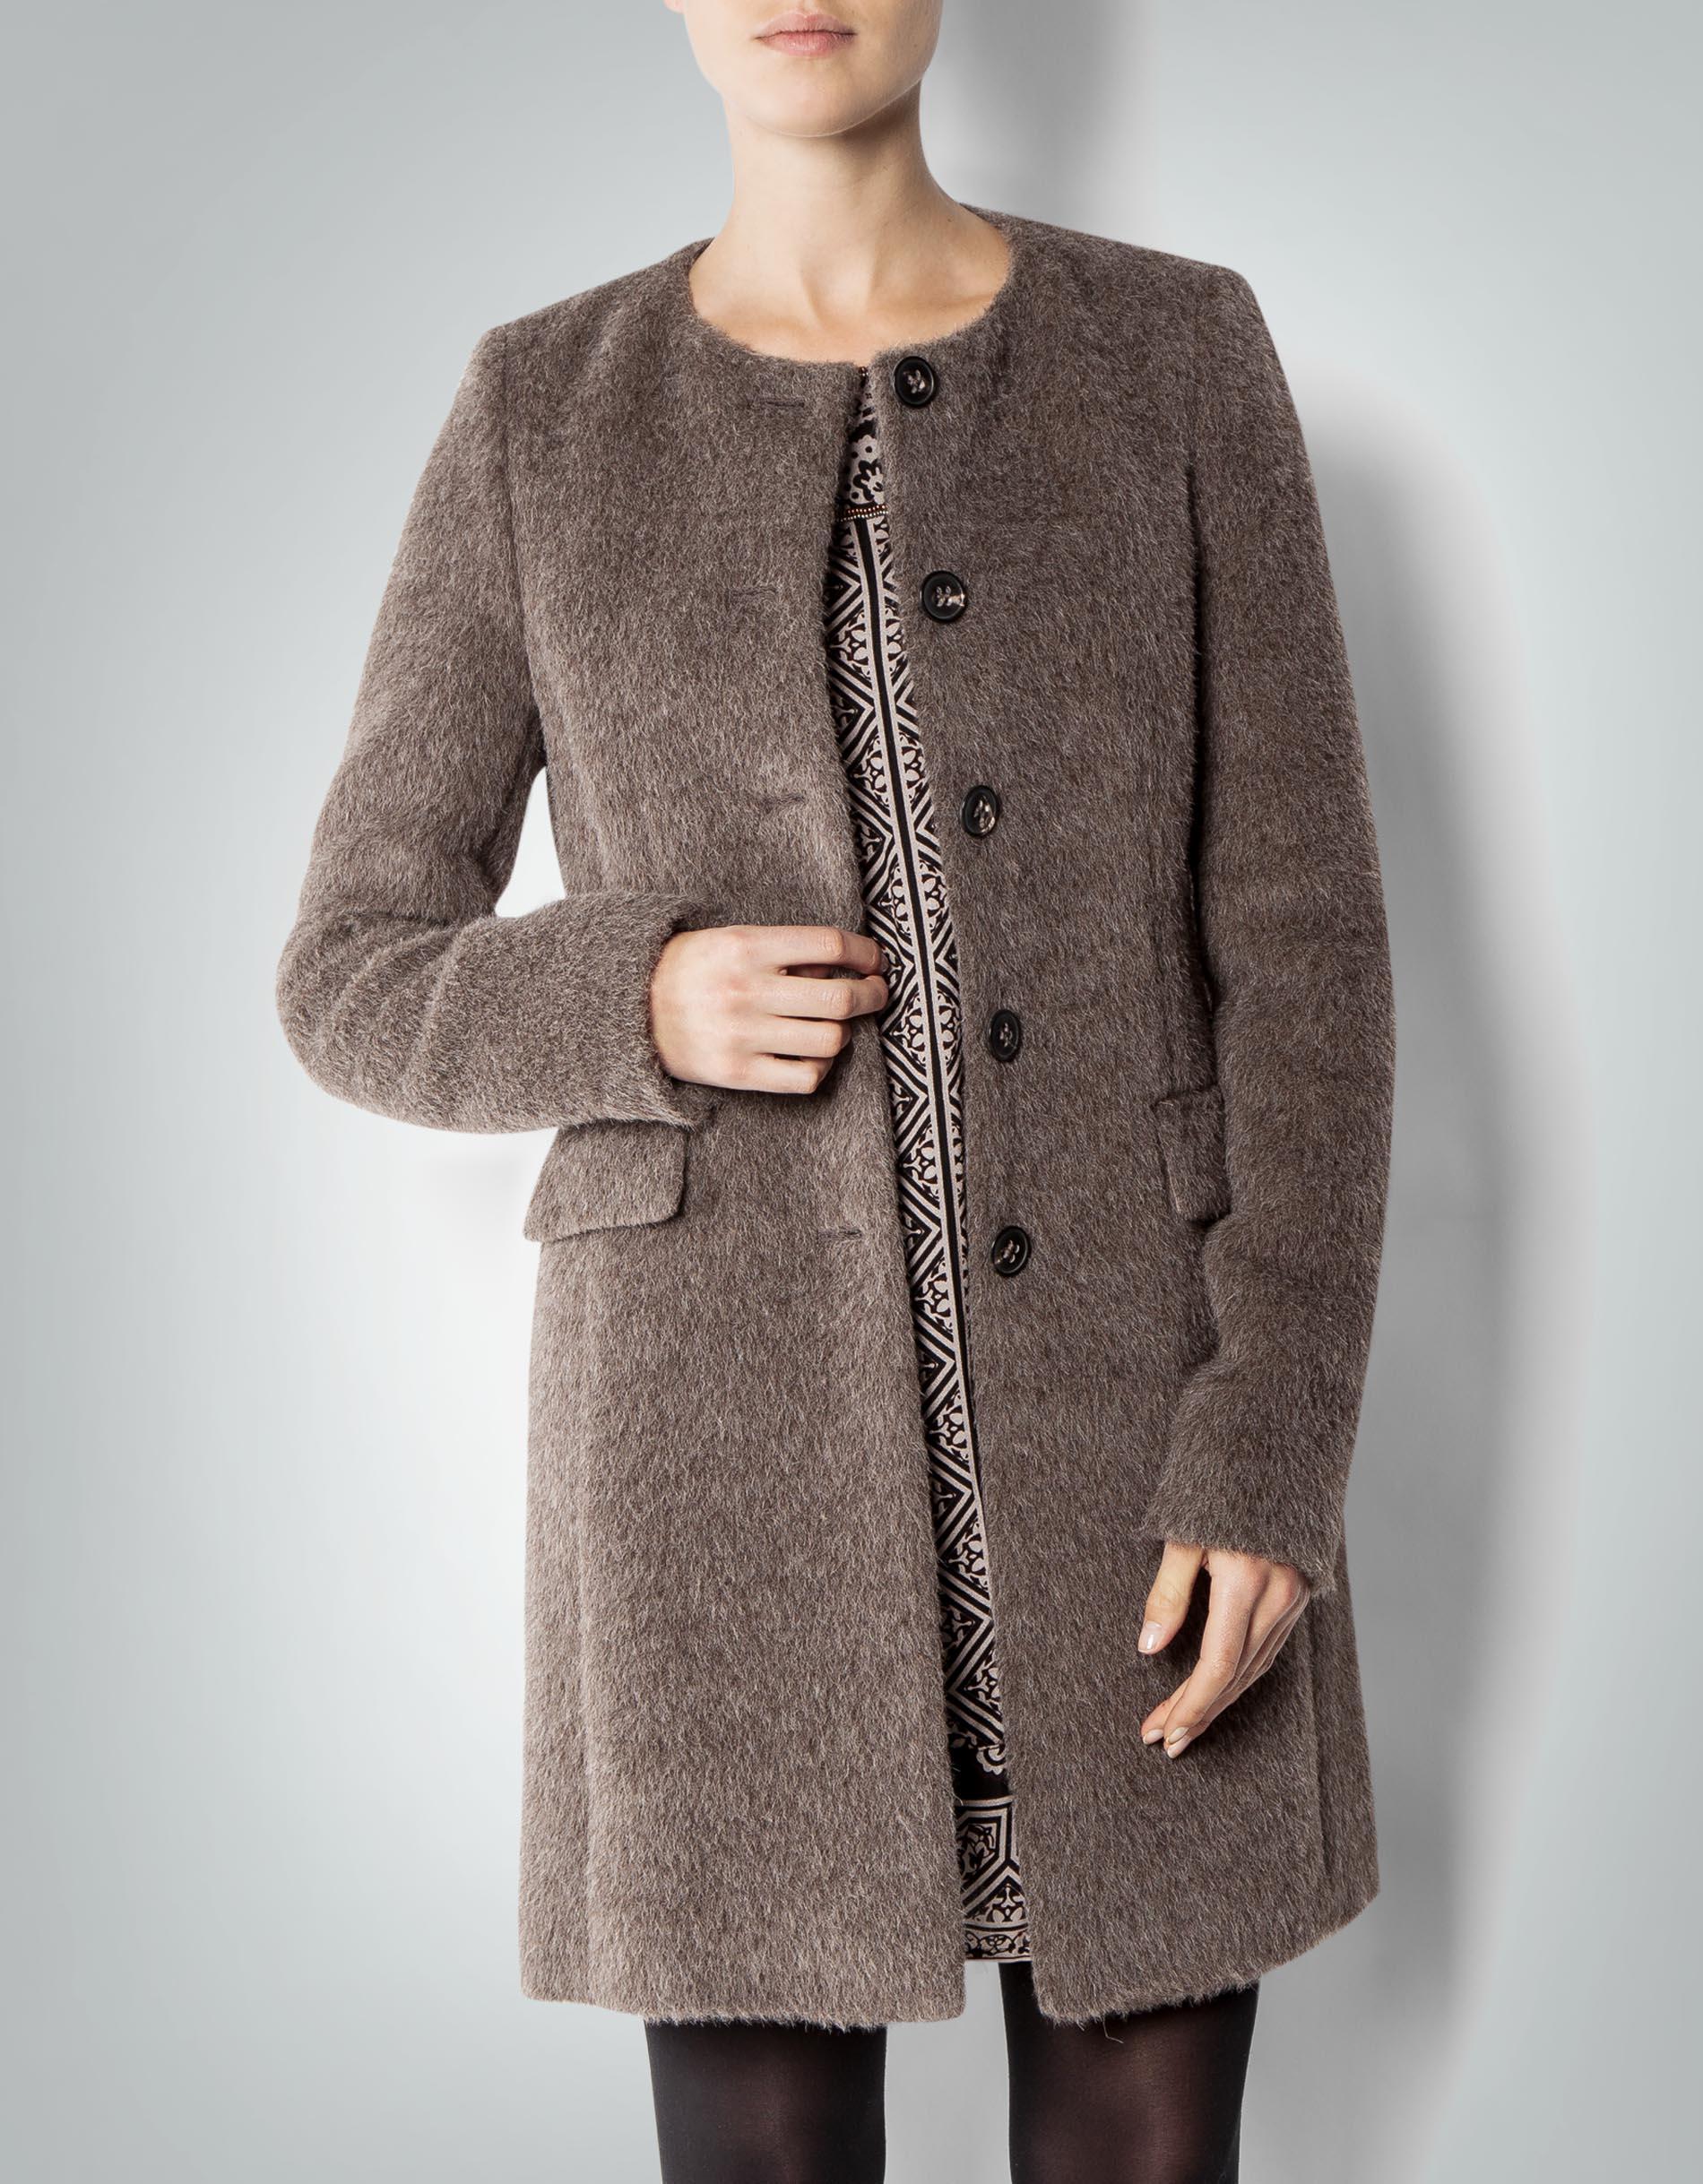 daniel hechter damen mantel beige in fell optik empfohlen. Black Bedroom Furniture Sets. Home Design Ideas